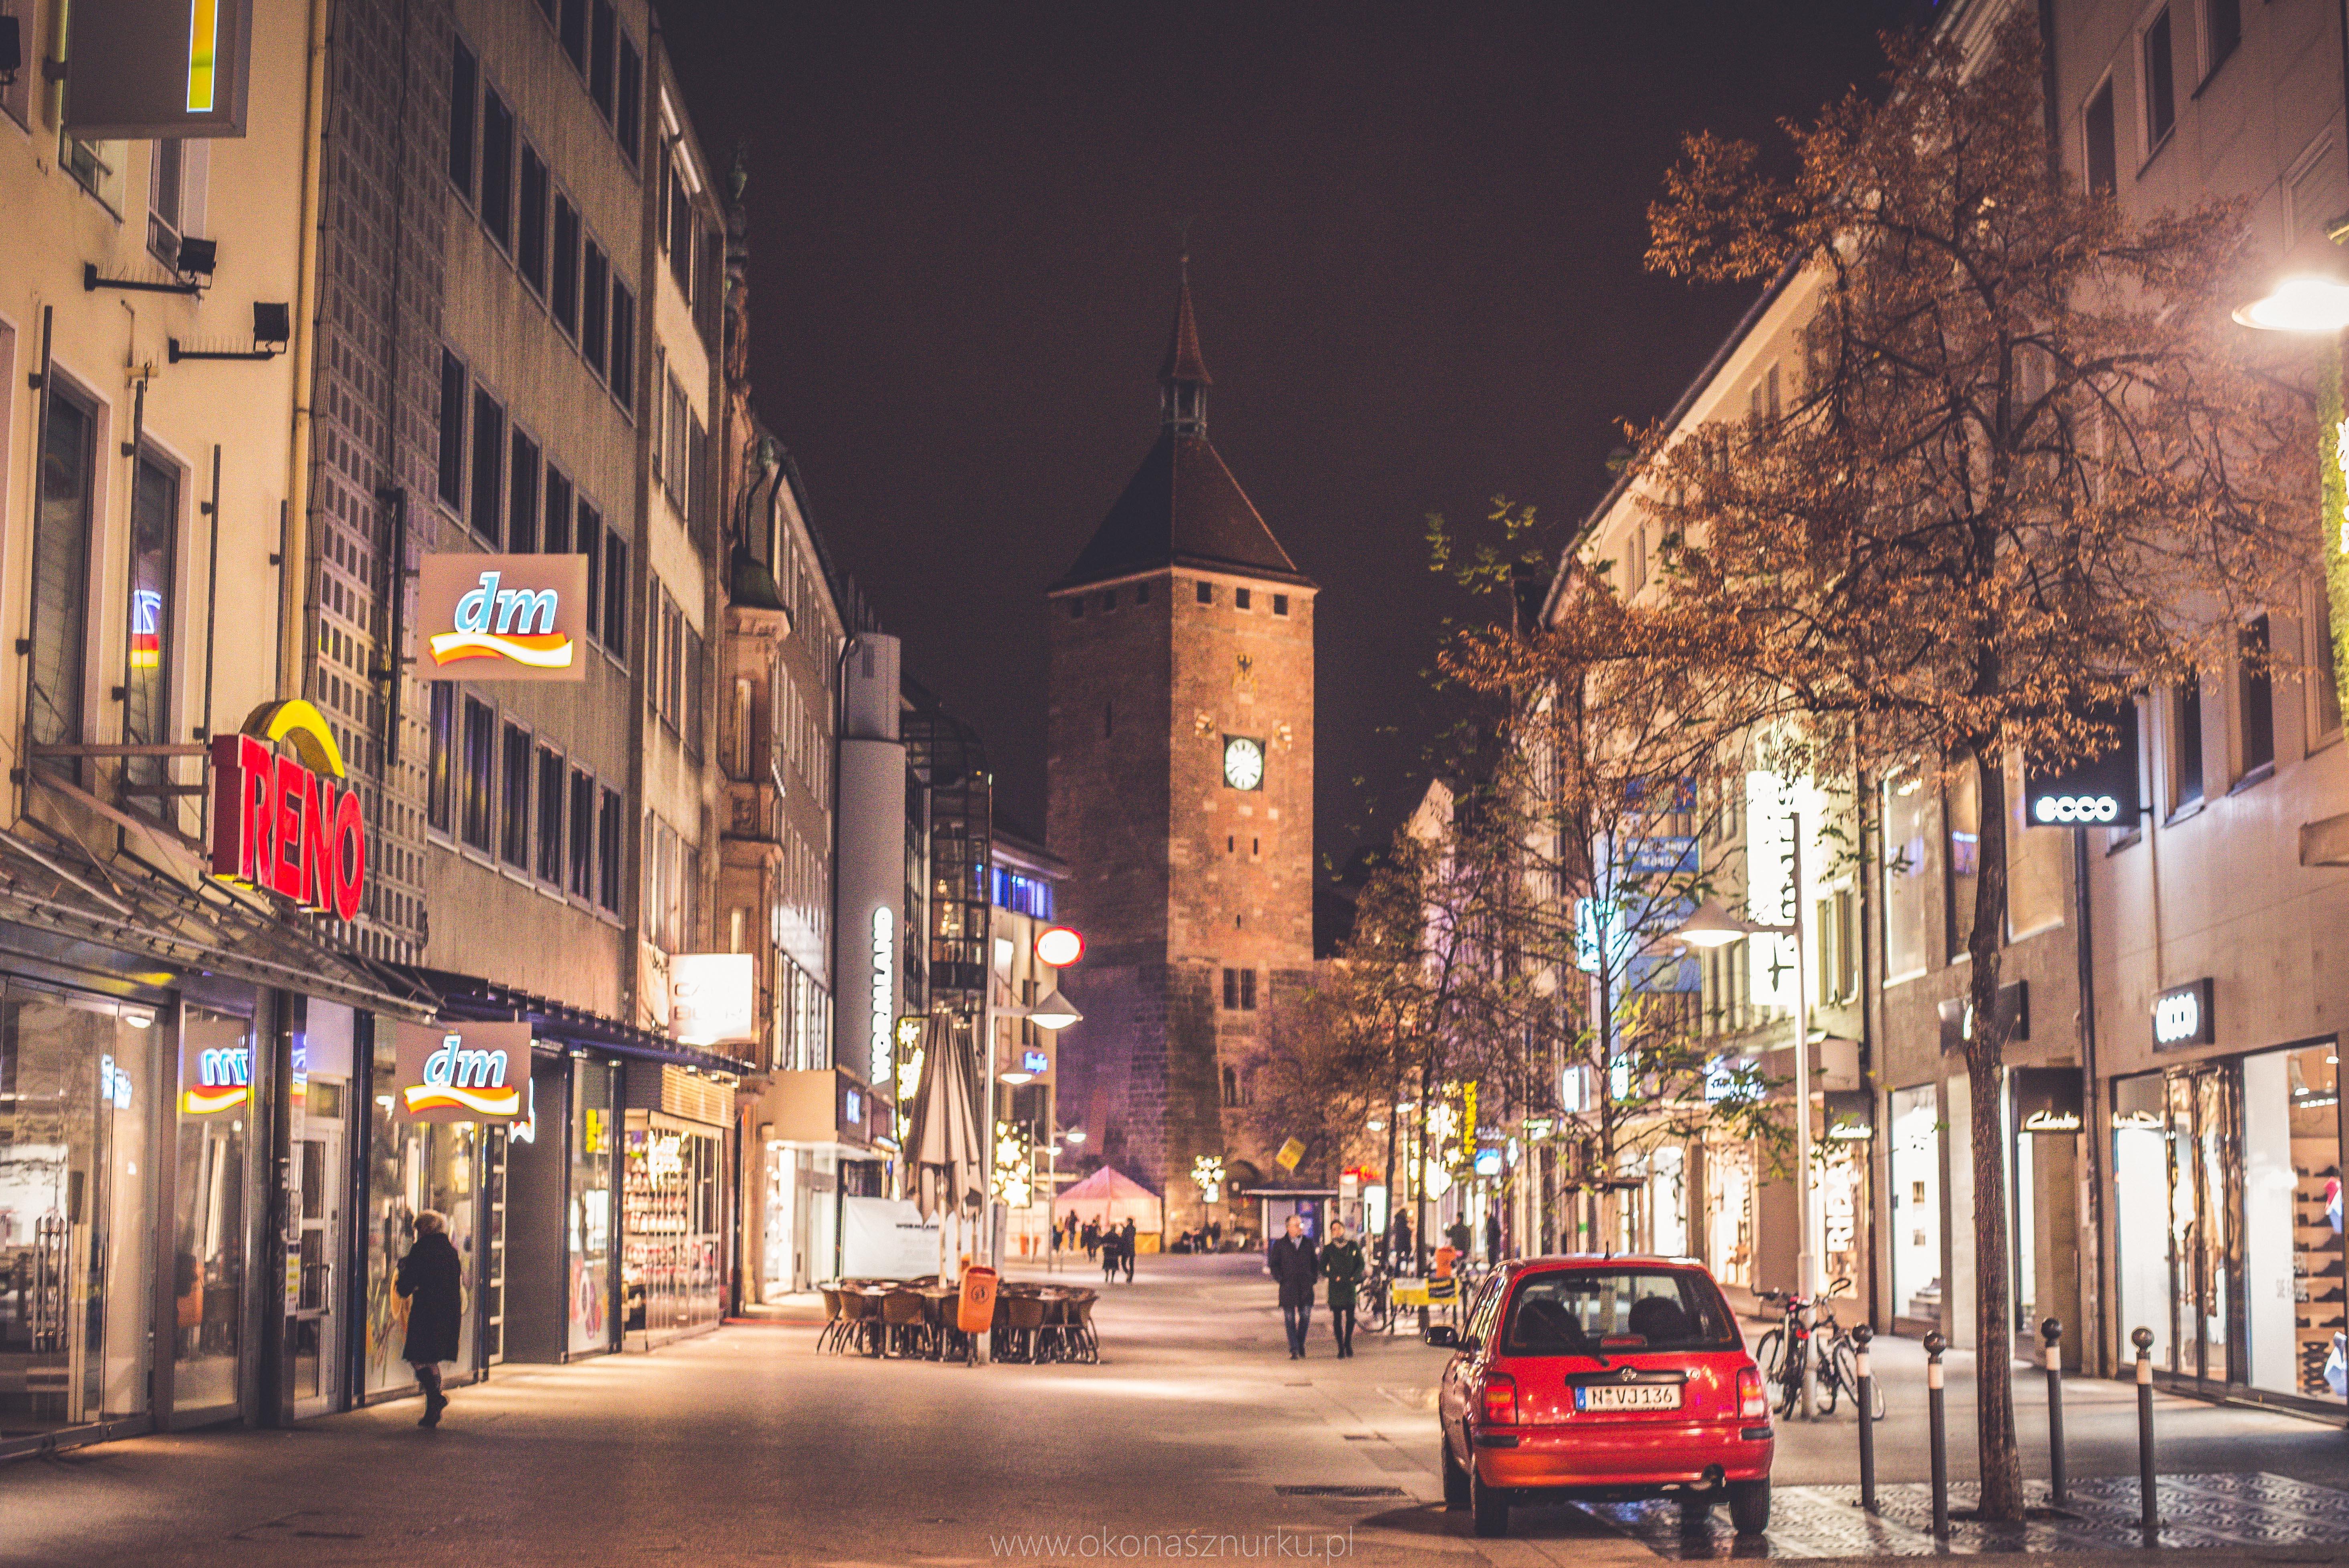 Nürnberg-stadt-norymberga-bayern-city-frankonia (46)